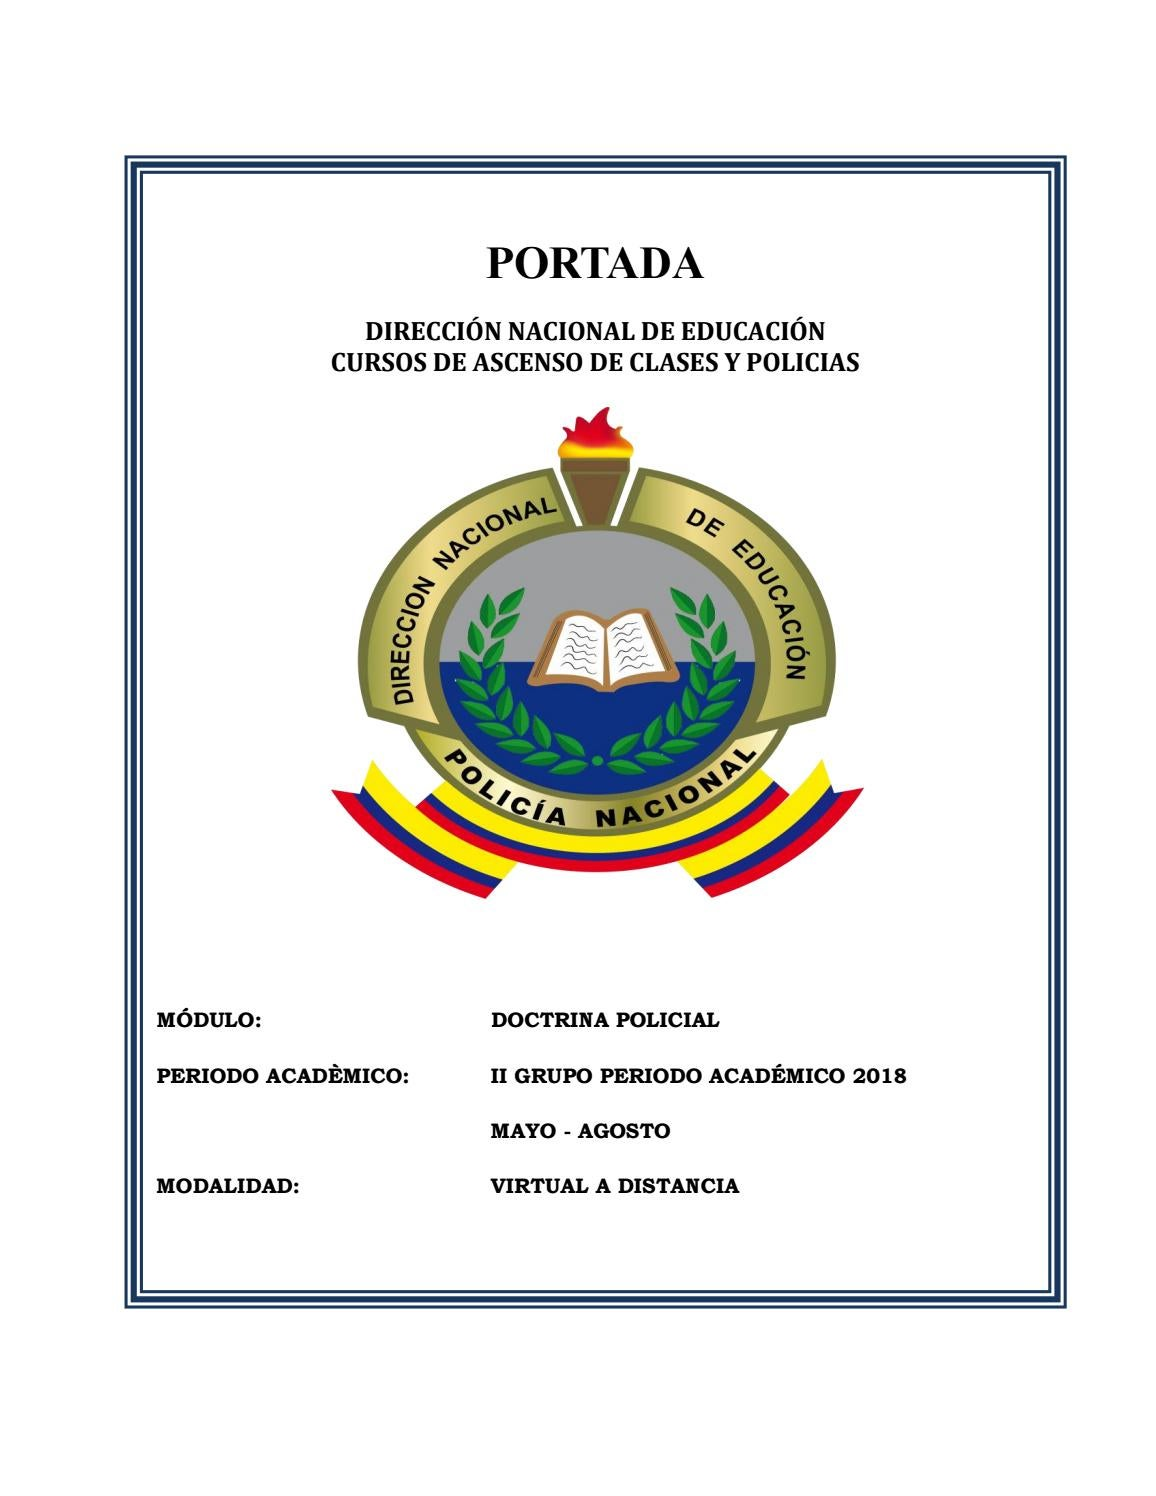 Modulo De Doctrina Policial By Sinthia Moreta Ramírez Issuu